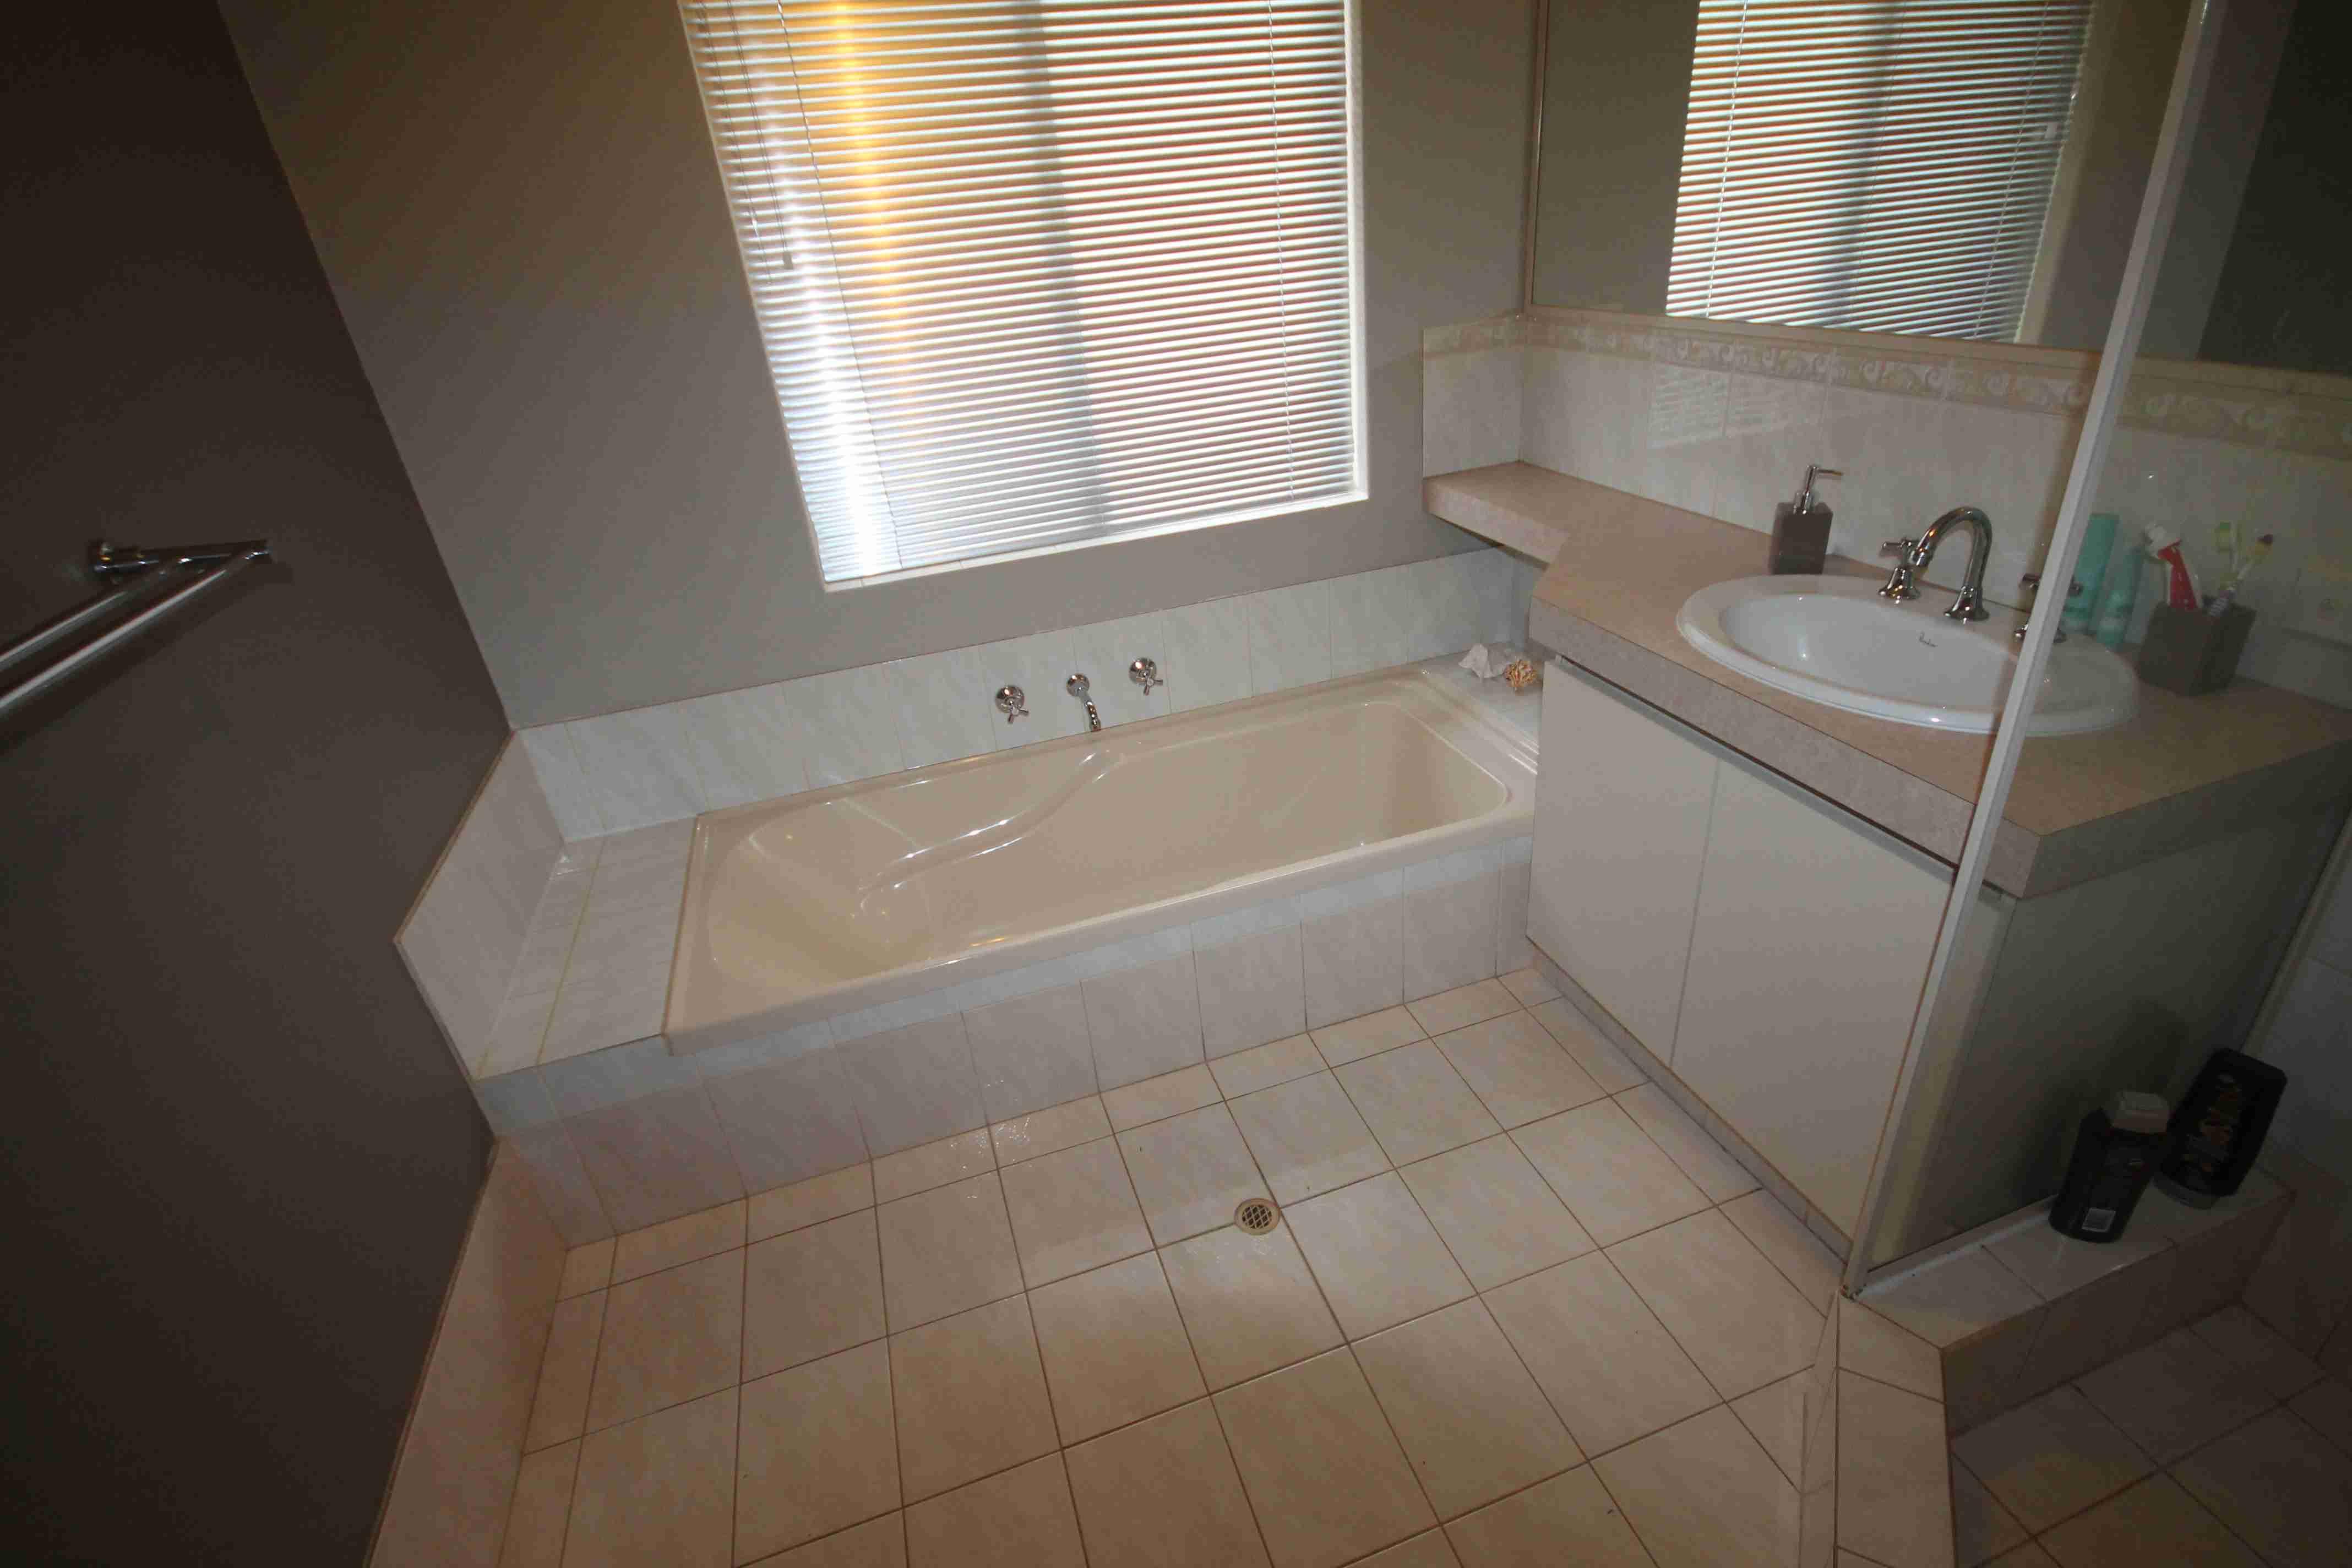 Wayne rose r bathroom bathroom renovations perth for Bathroom renovations 3d